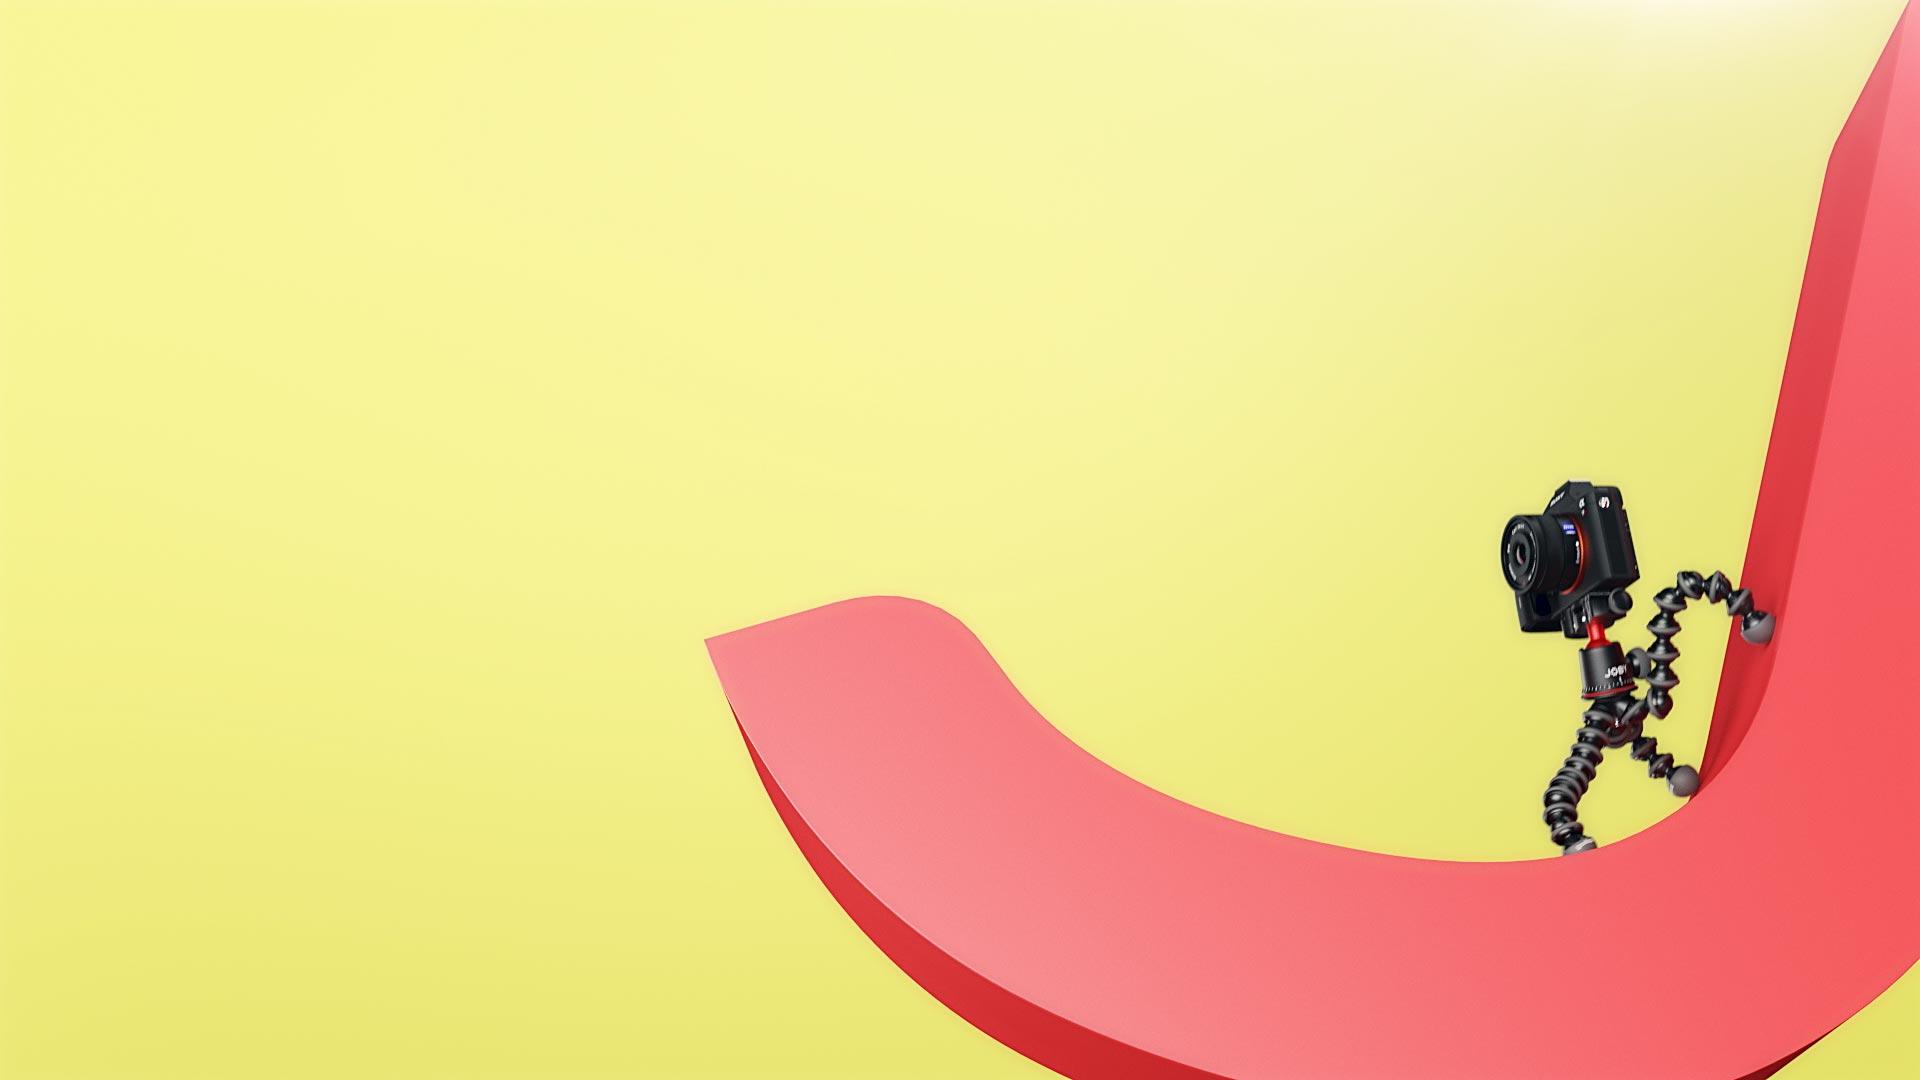 joby_logo_animation_motion_racoon_2